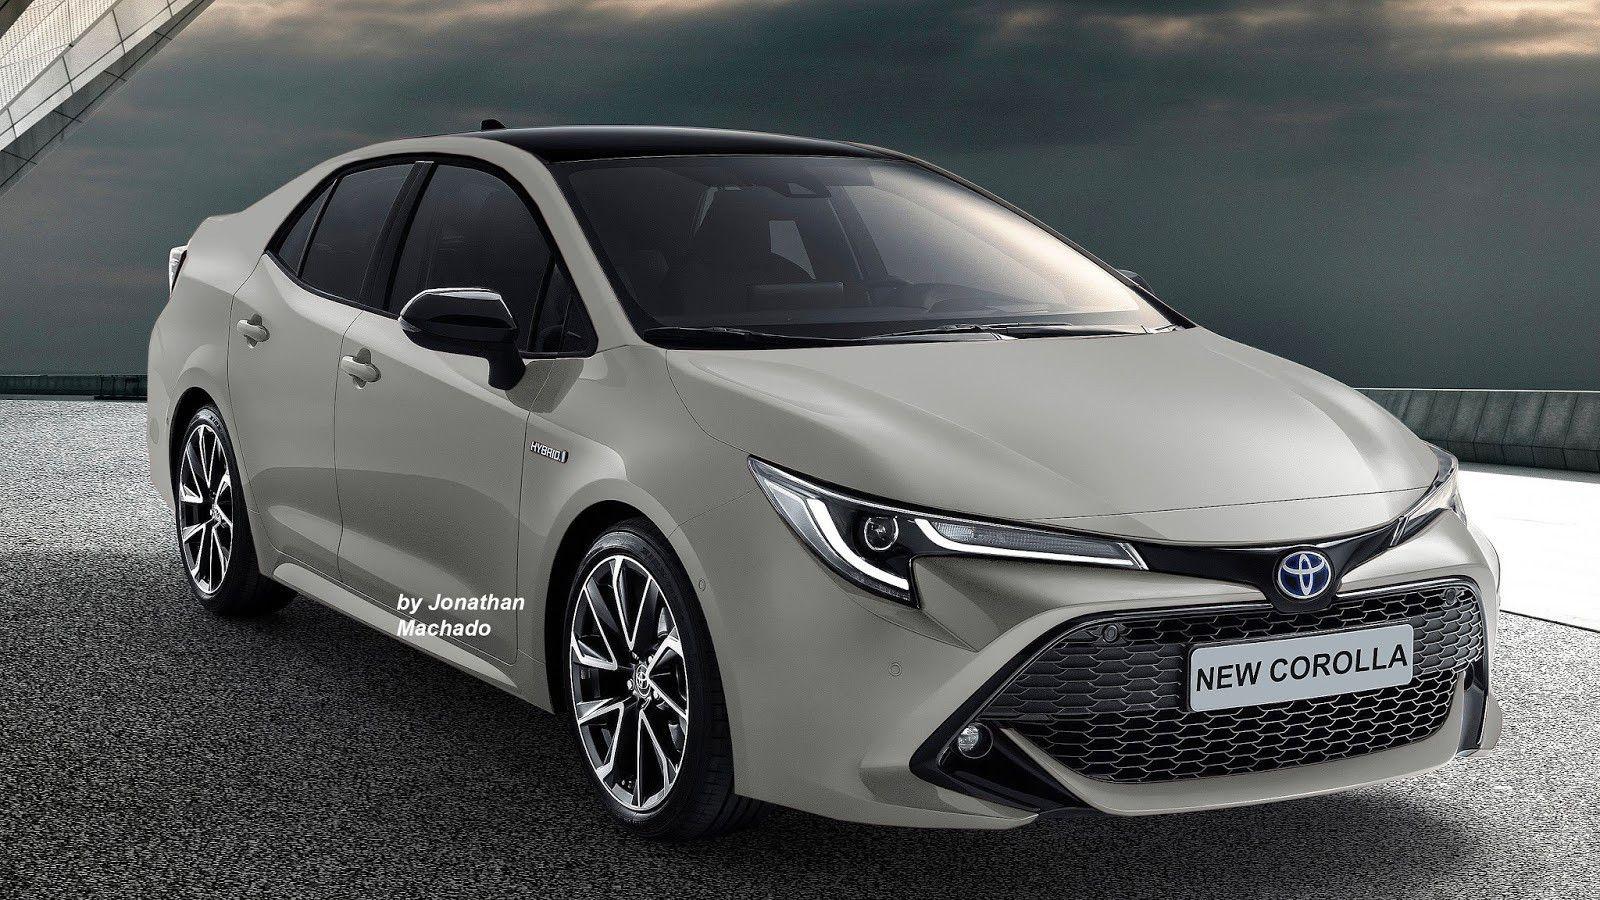 2019 Toyota Corolla S Toyota Corolla New Generation New Toyota